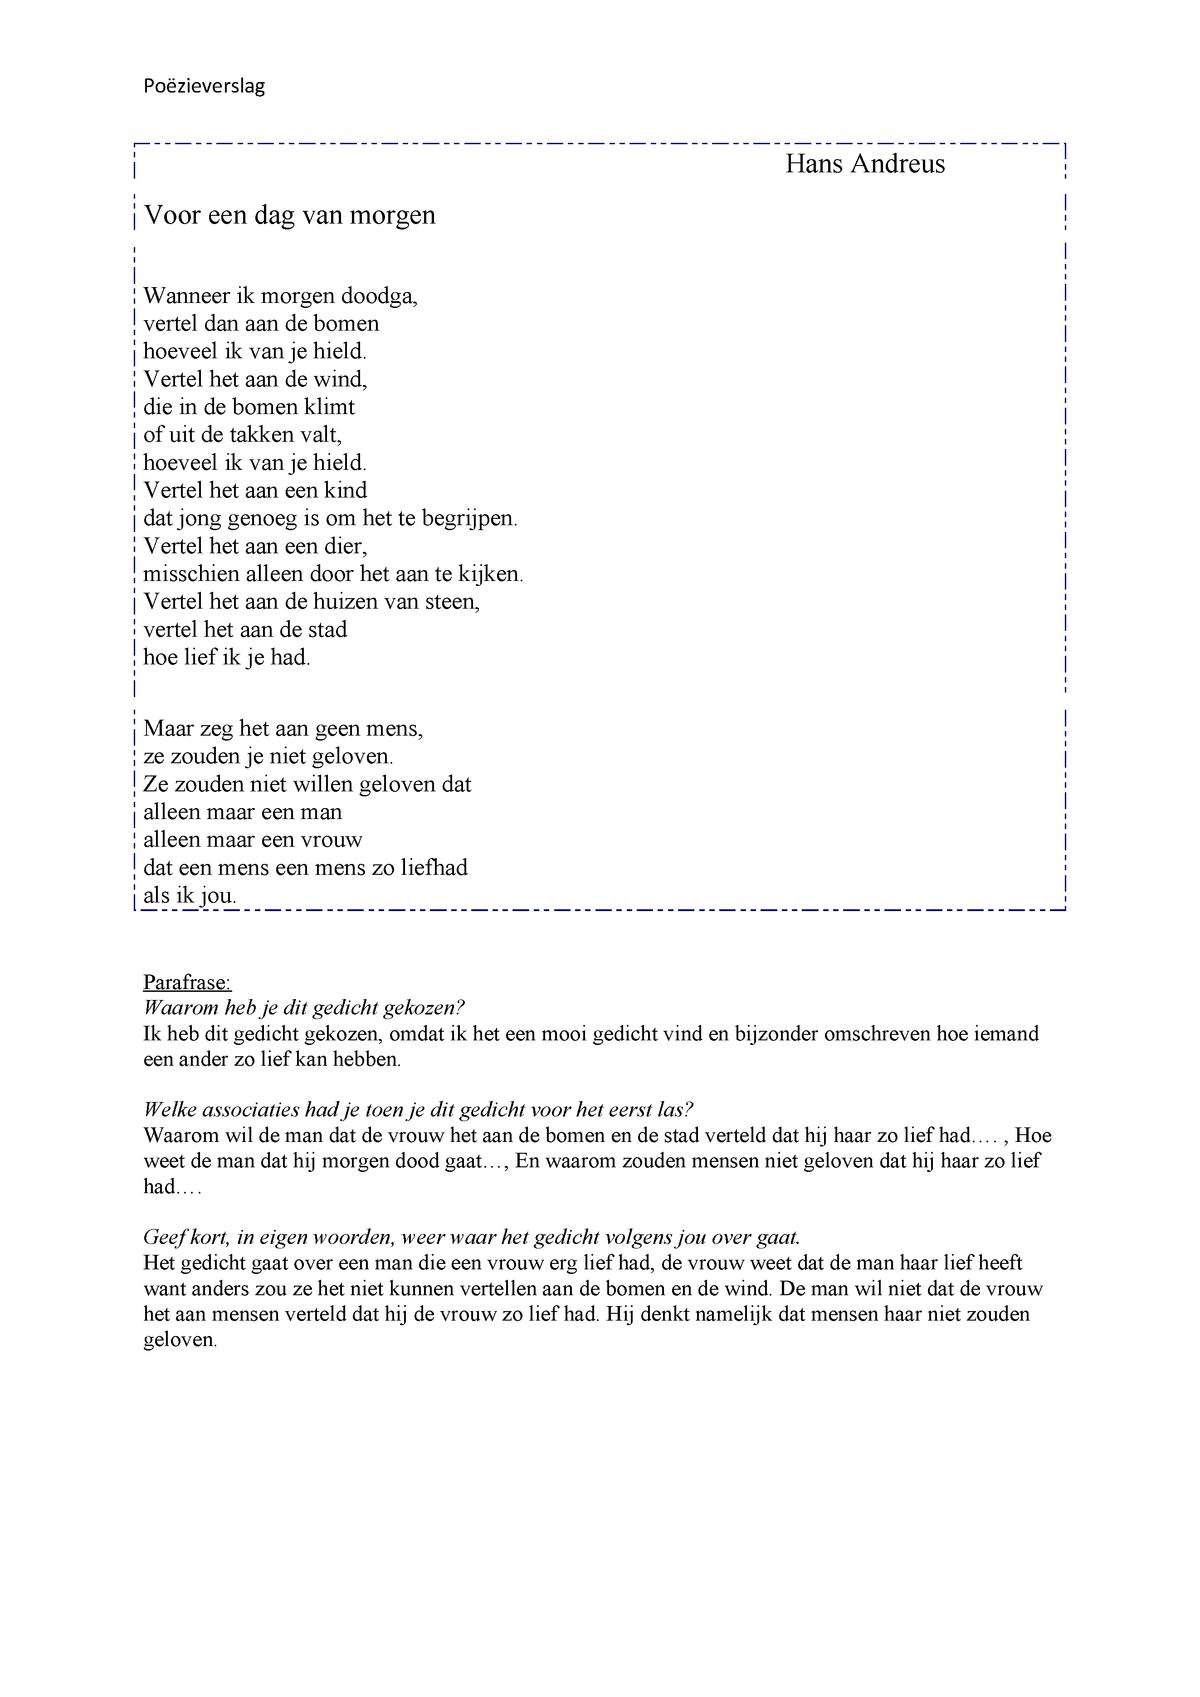 Poezieverslag Nederlands Nhl Stenden Studeersnel